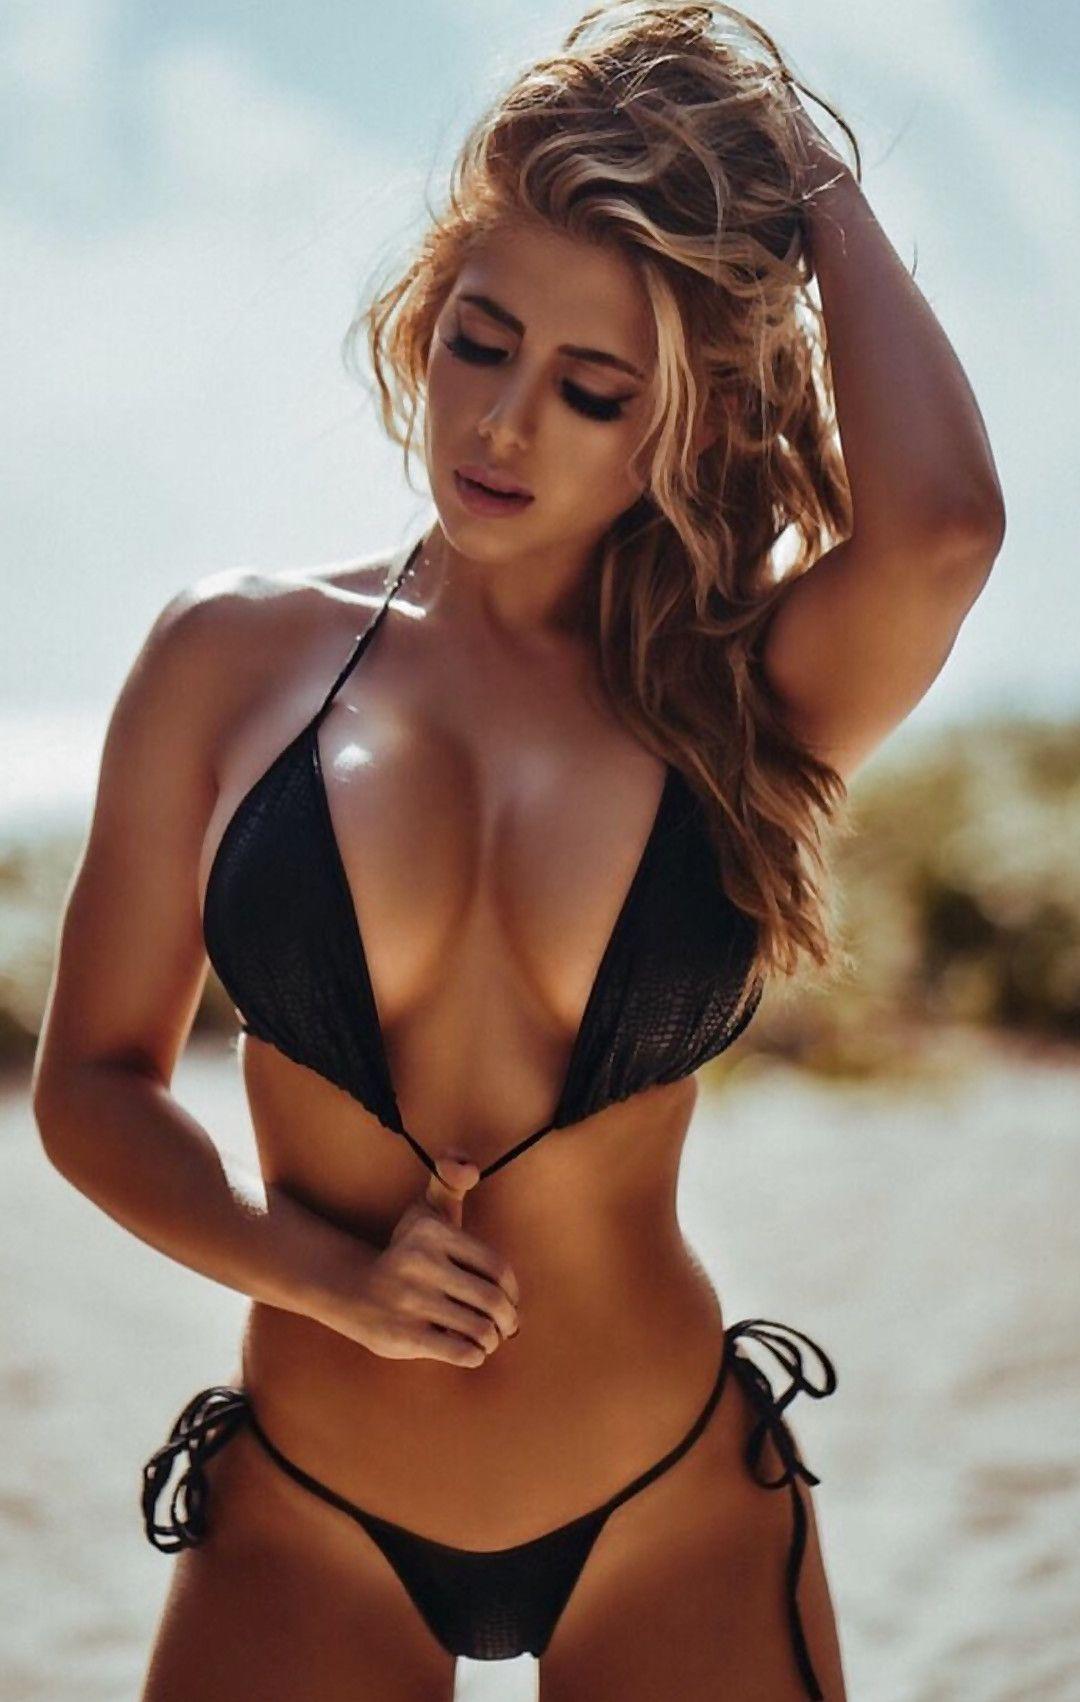 Hot Girl Summer Bikini Try On Haul